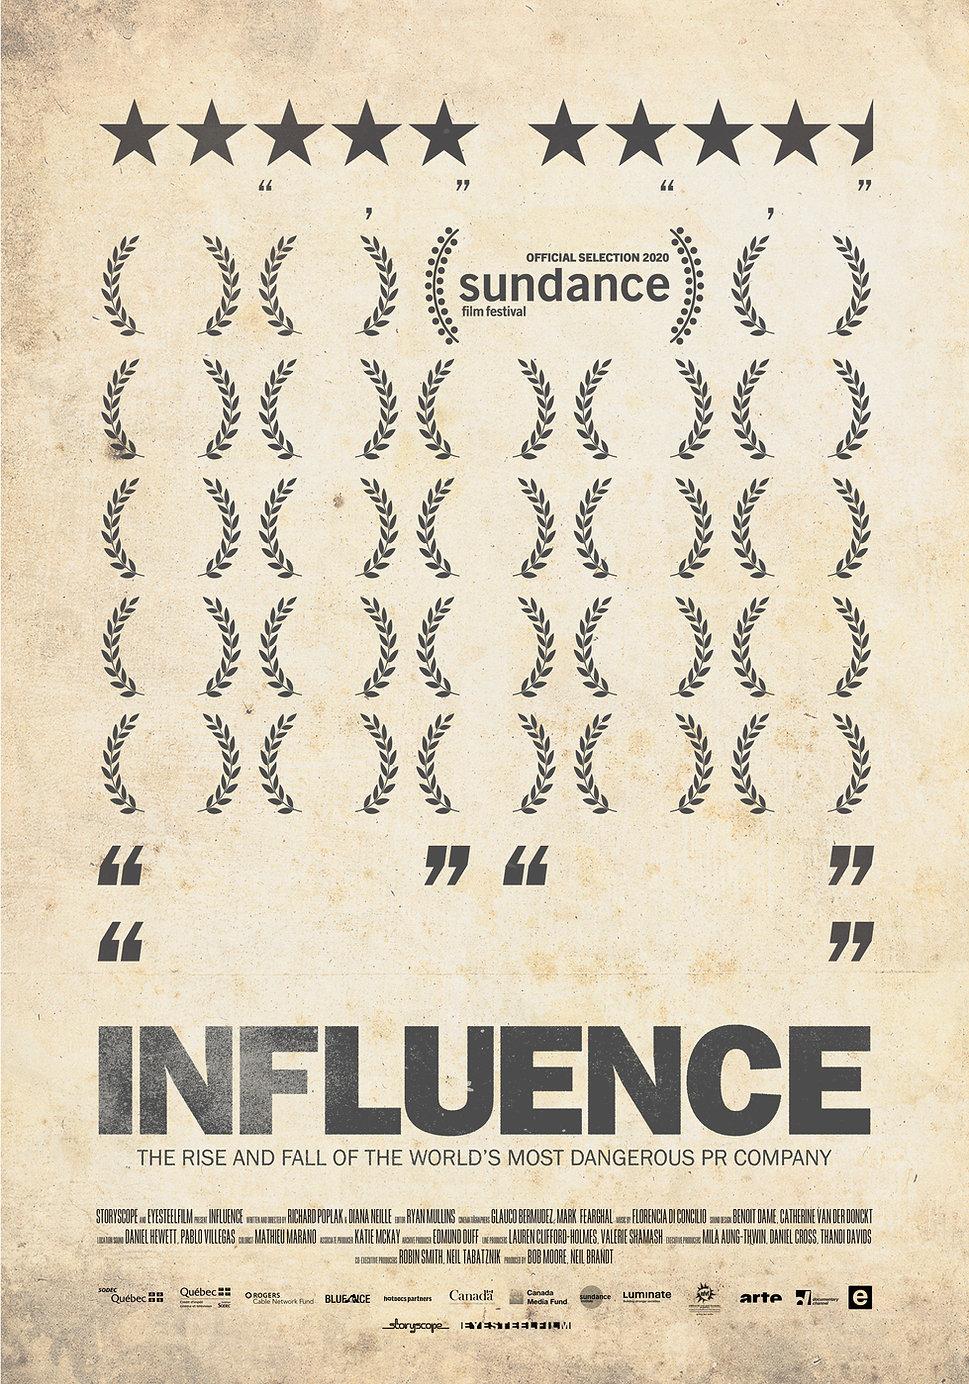 Influence_Saatchi.v3.jpg